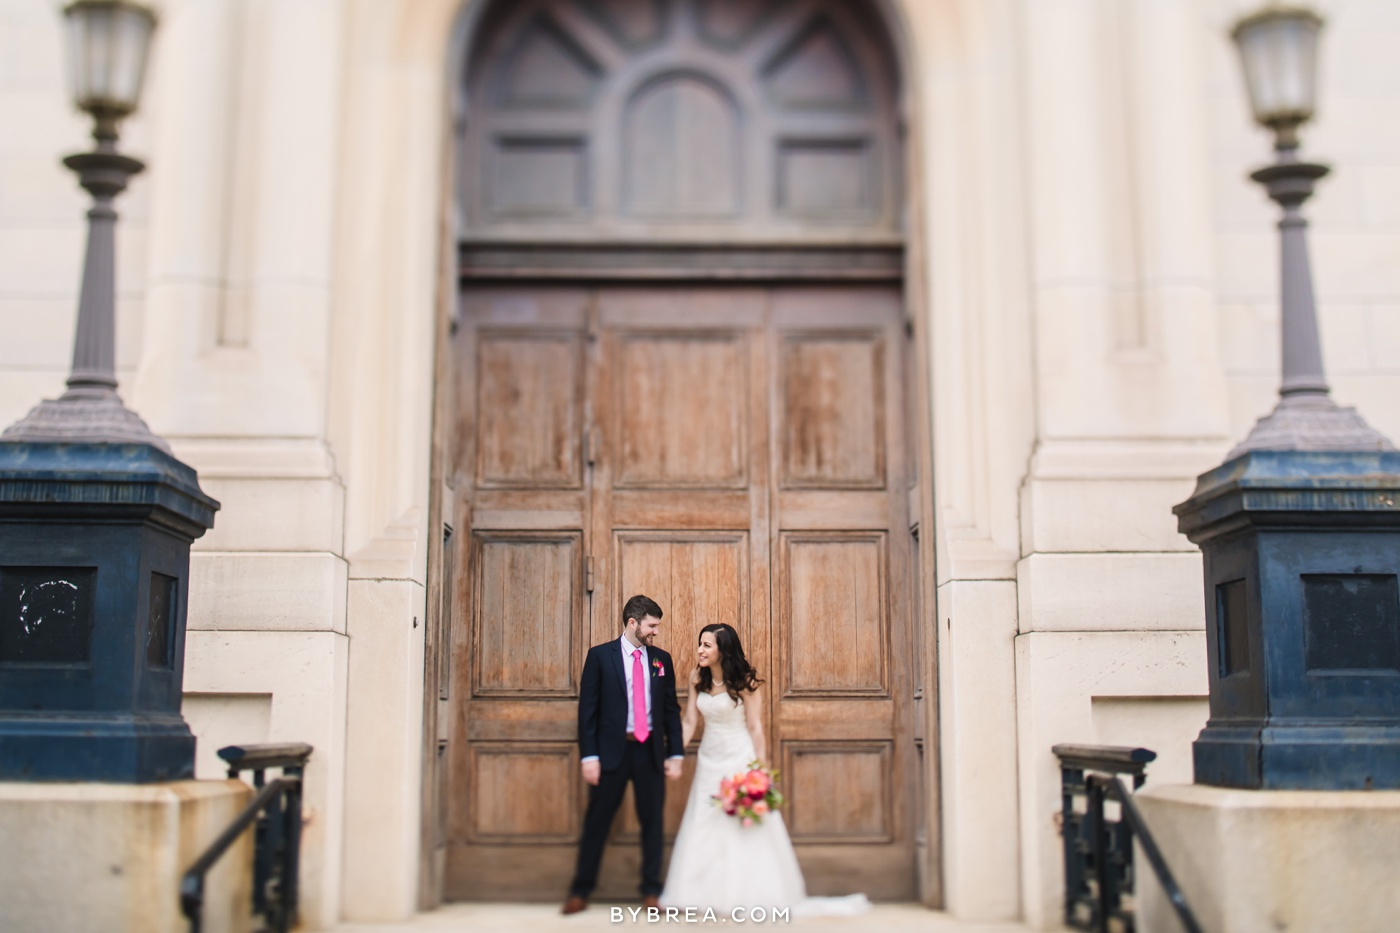 George Peabody Library wedding photo bride and groom portrait framed by doorway